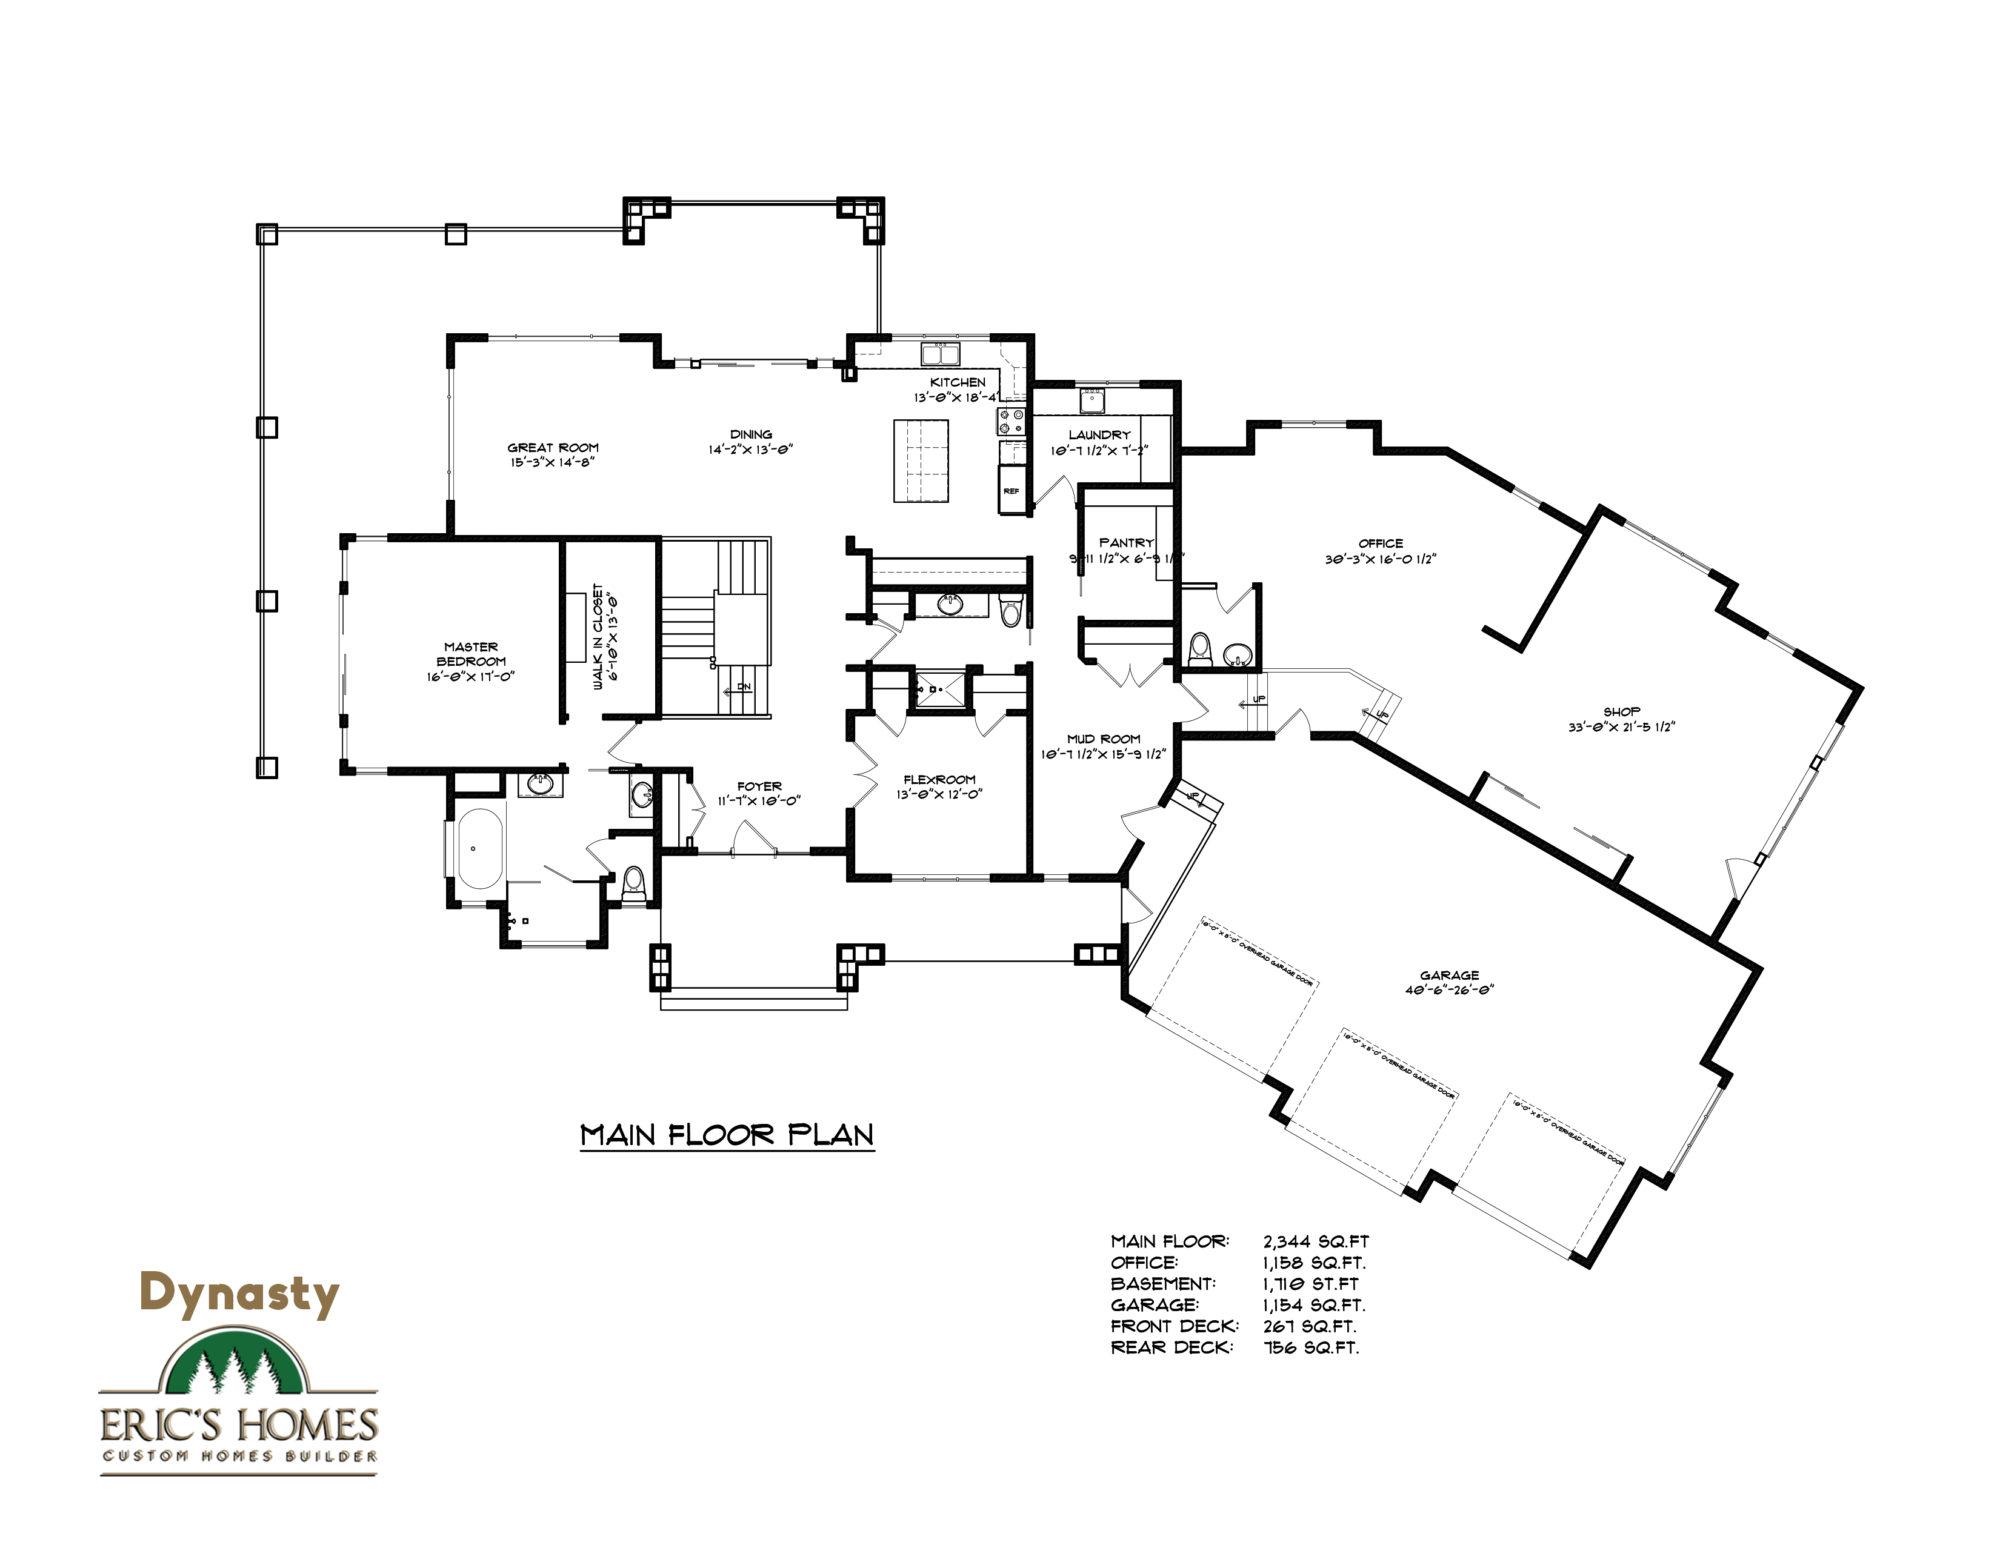 Dynasty brochure main floor plan)